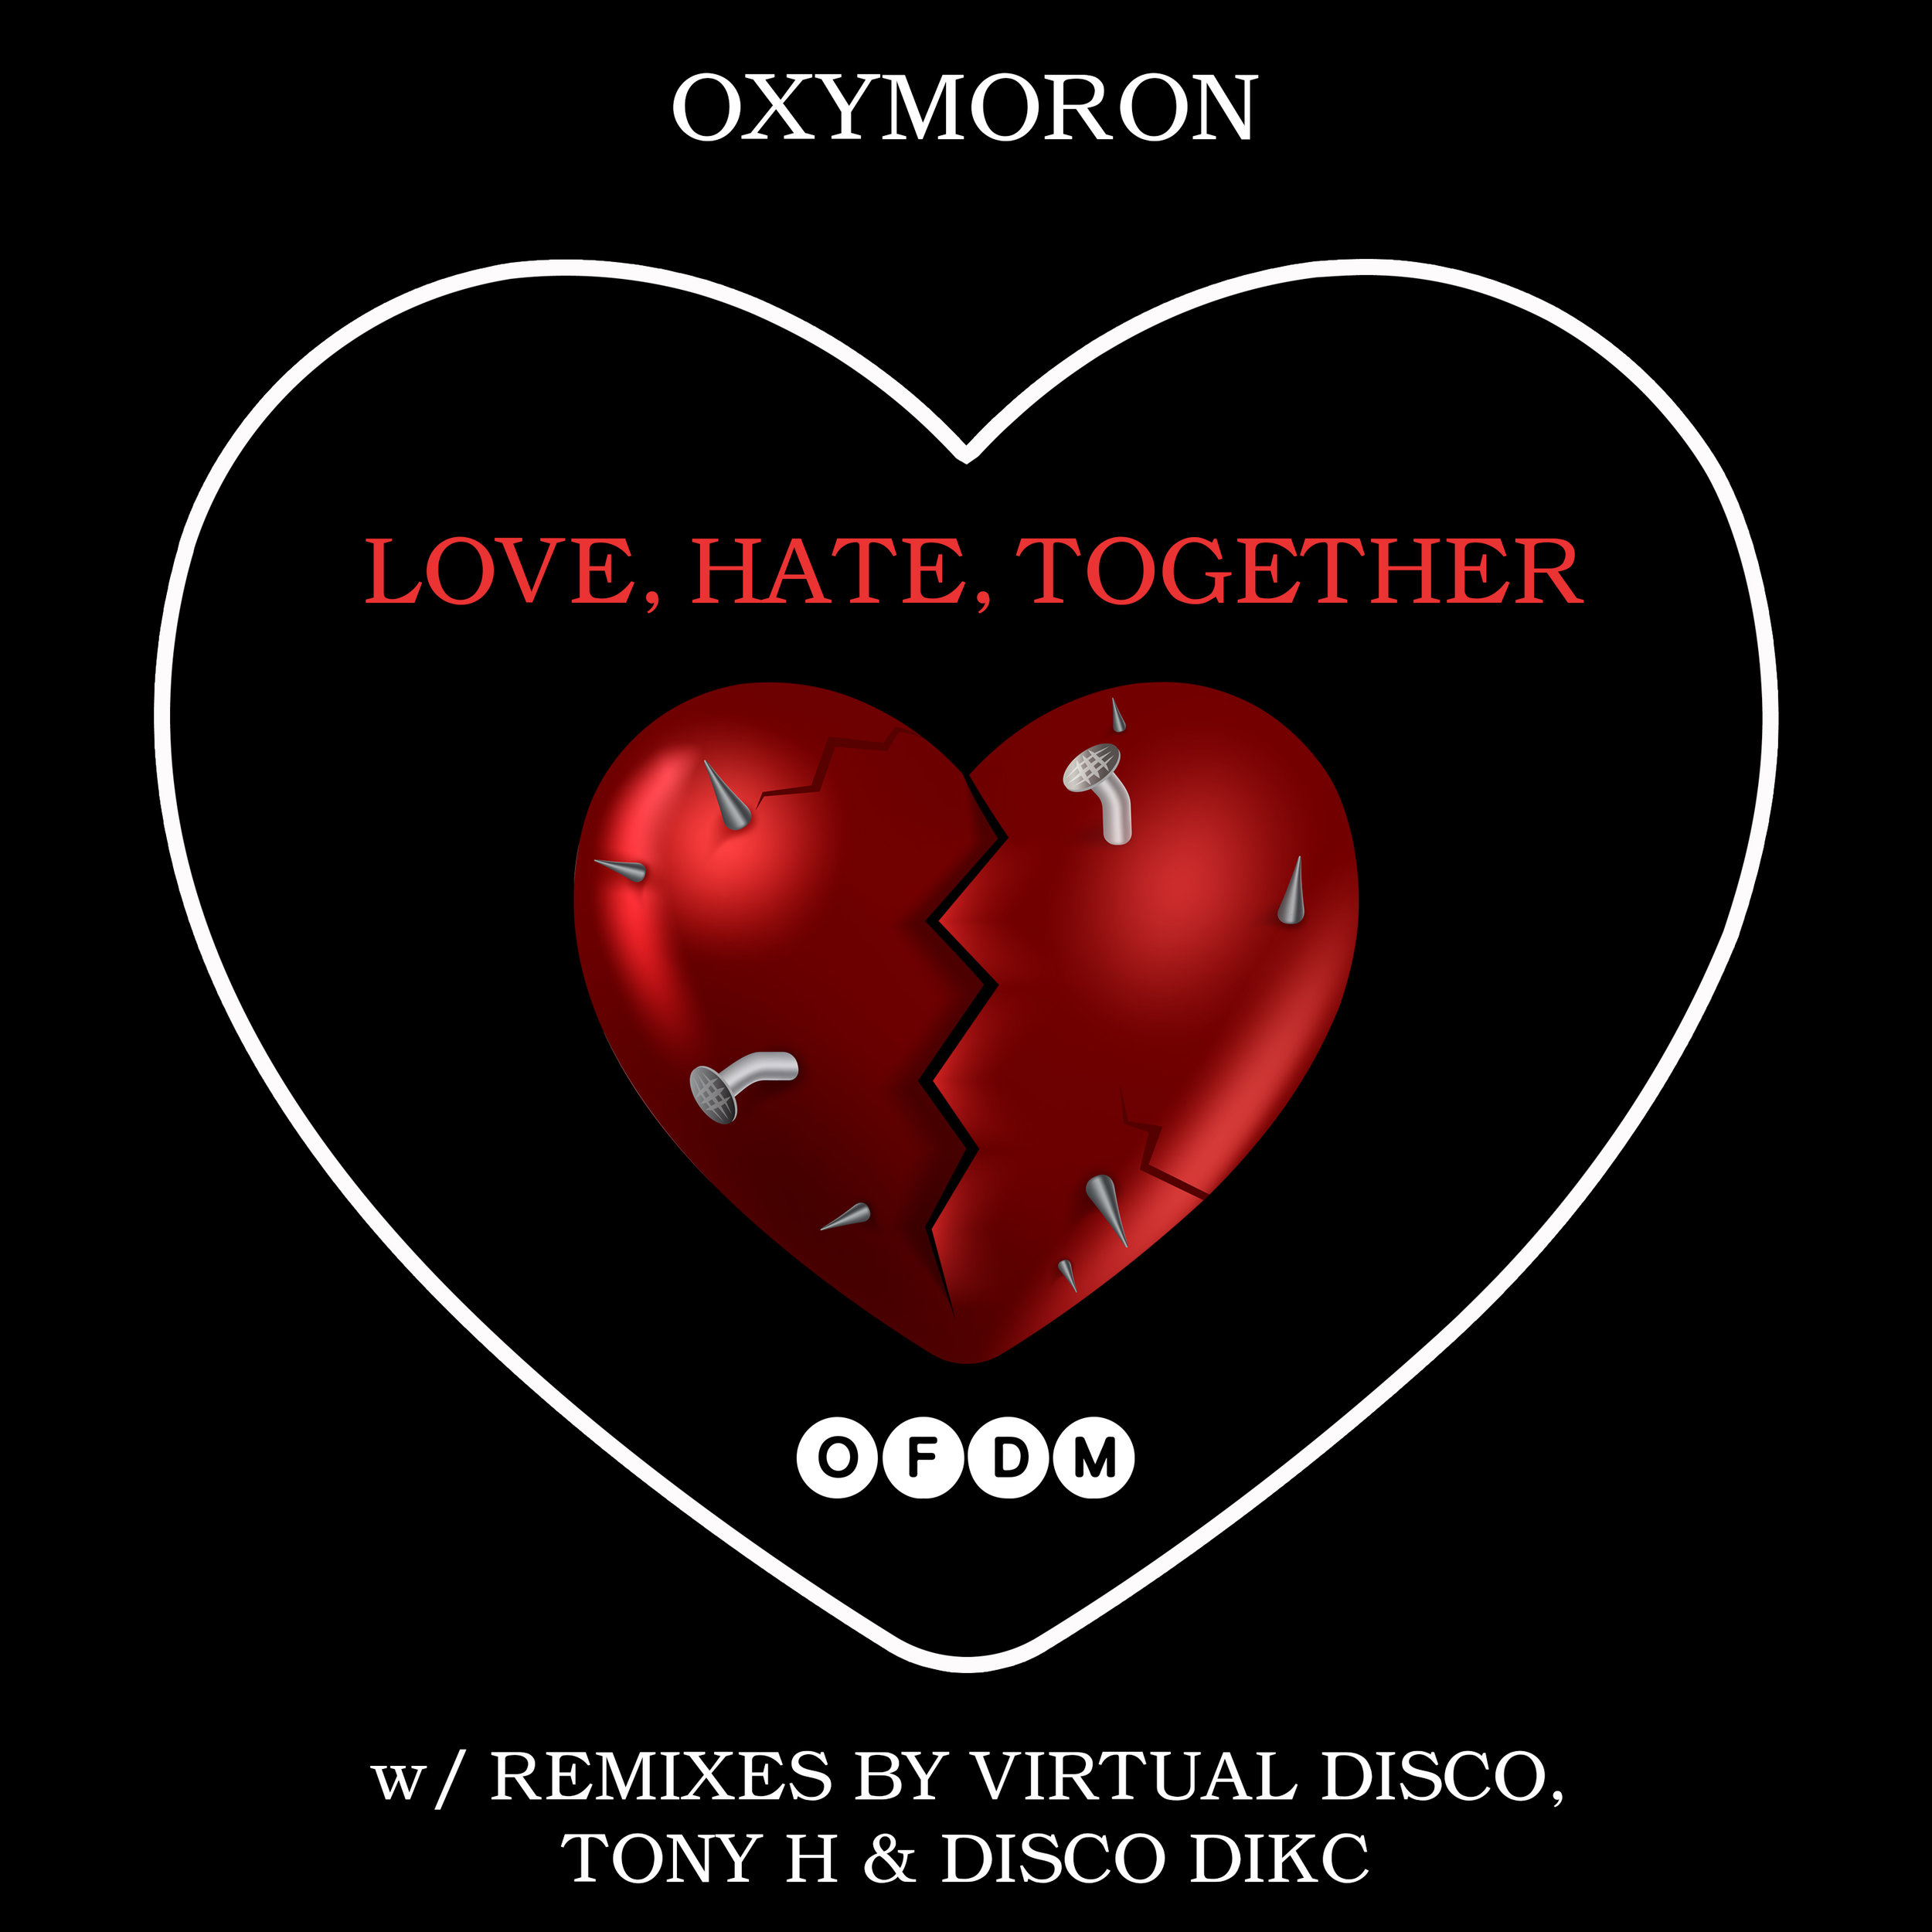 [OFDM037] OxyMoron - Love, Hate, Together EP (ARTWORK).jpg